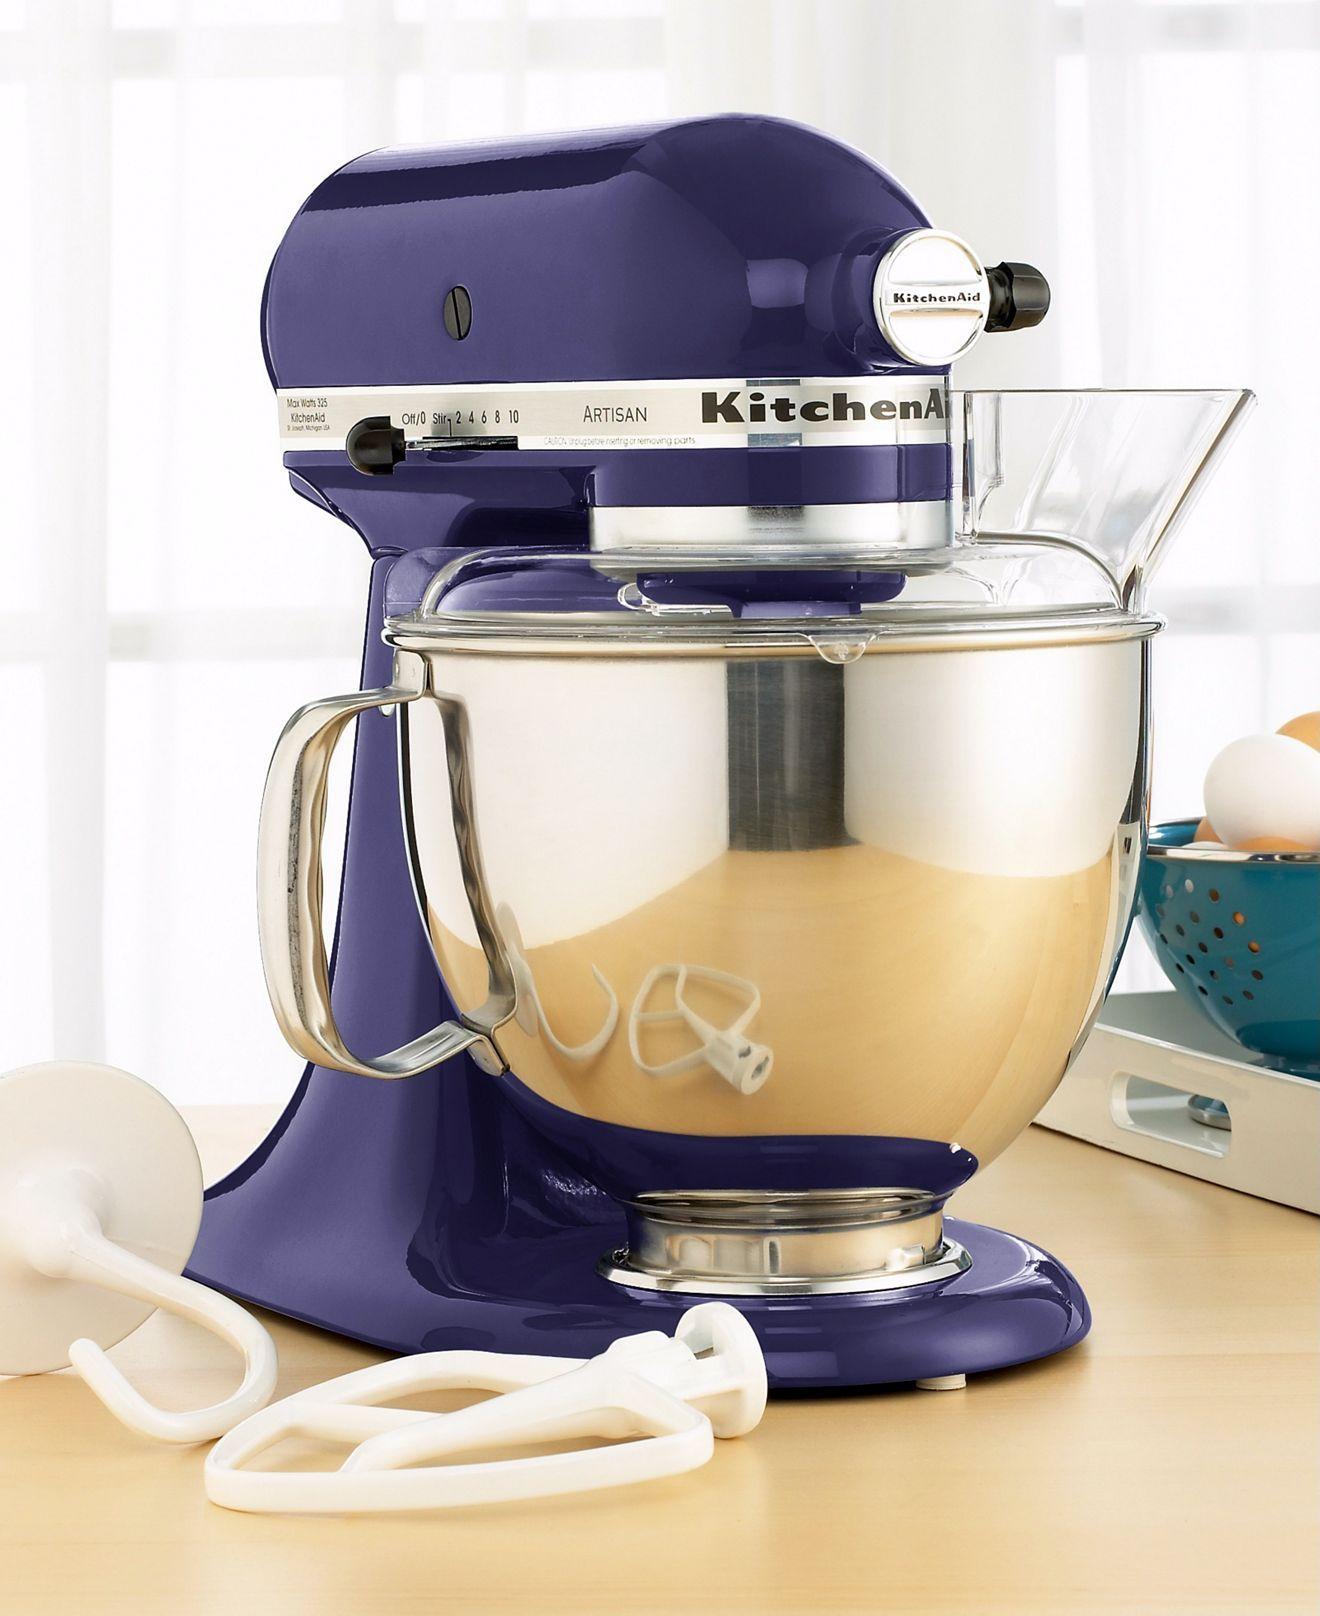 Artisan 5 qt stand mixer ksm150ps kitchenaid artisan